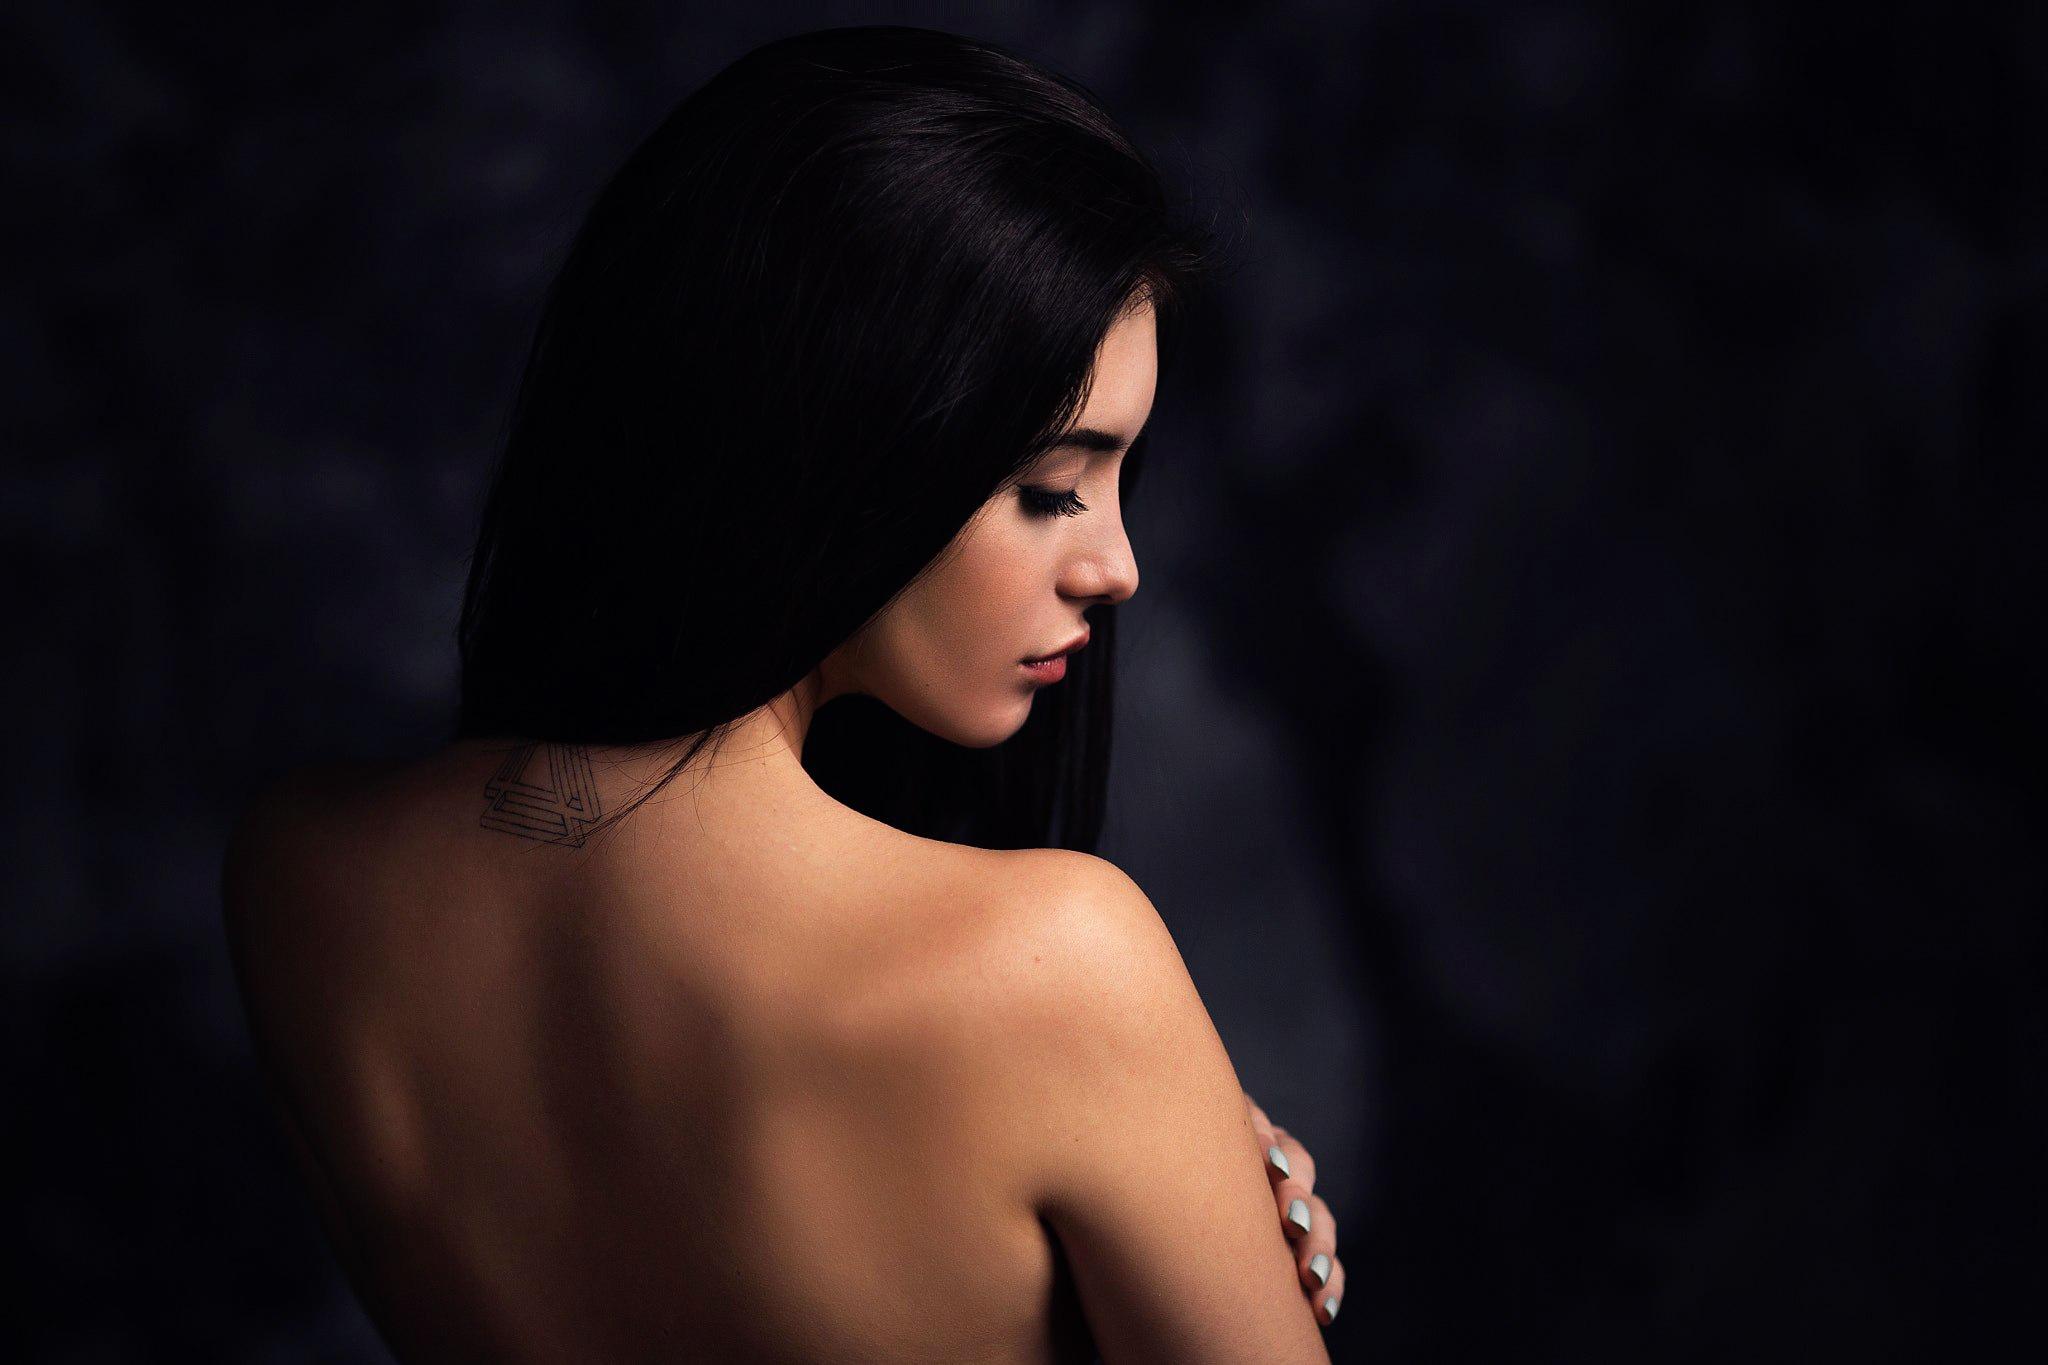 Онлайн фото со спины девушек брюнеток домохозяйка японка фильм